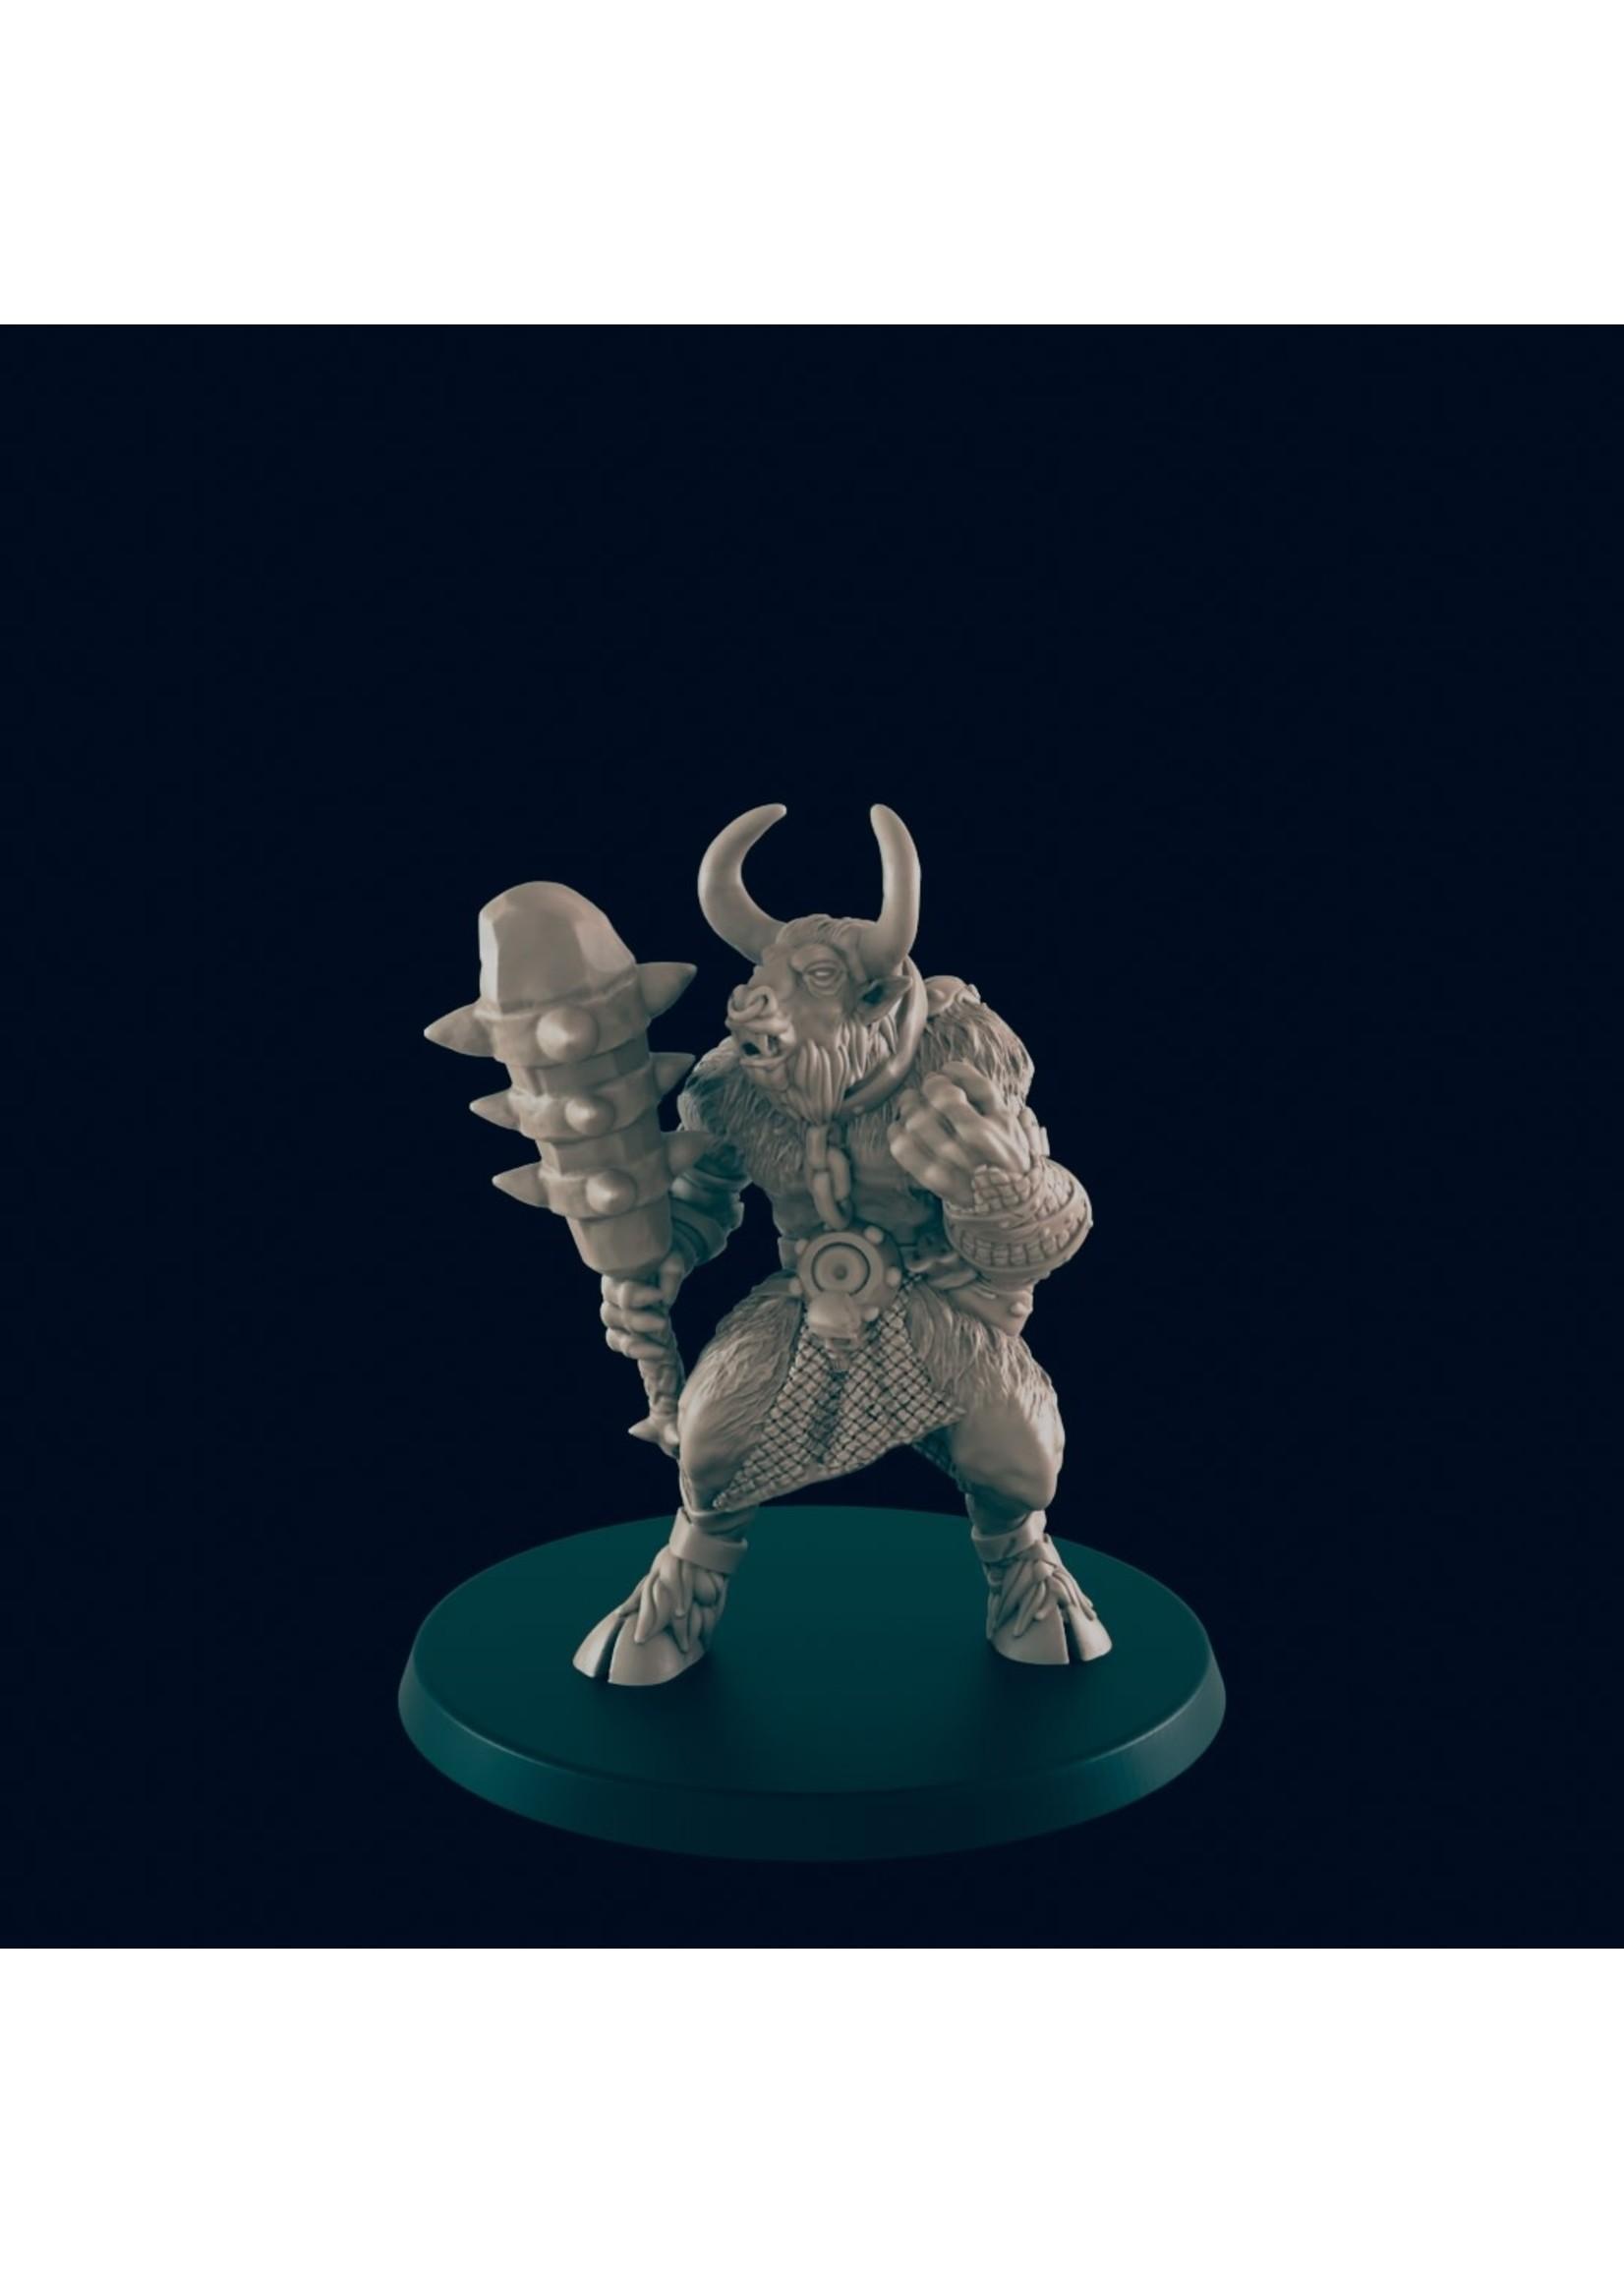 3D Printed Miniature - Minotaur - Dungeons & Dragons - Beasts and Baddies KS